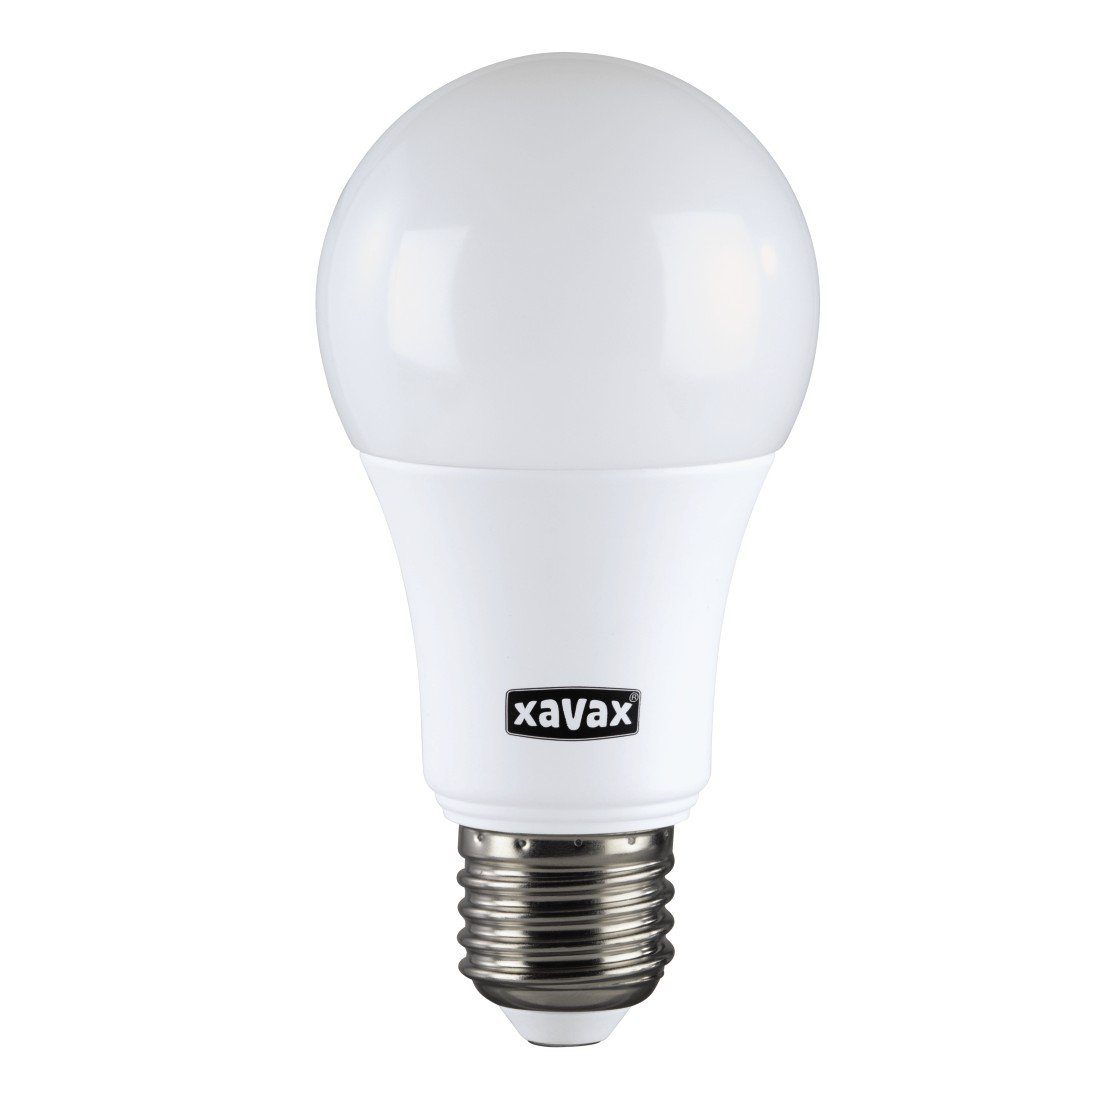 Xavax High Line LED-Lampe, 9,2W, Glühlampenform, E27, Warmweiß, RA90